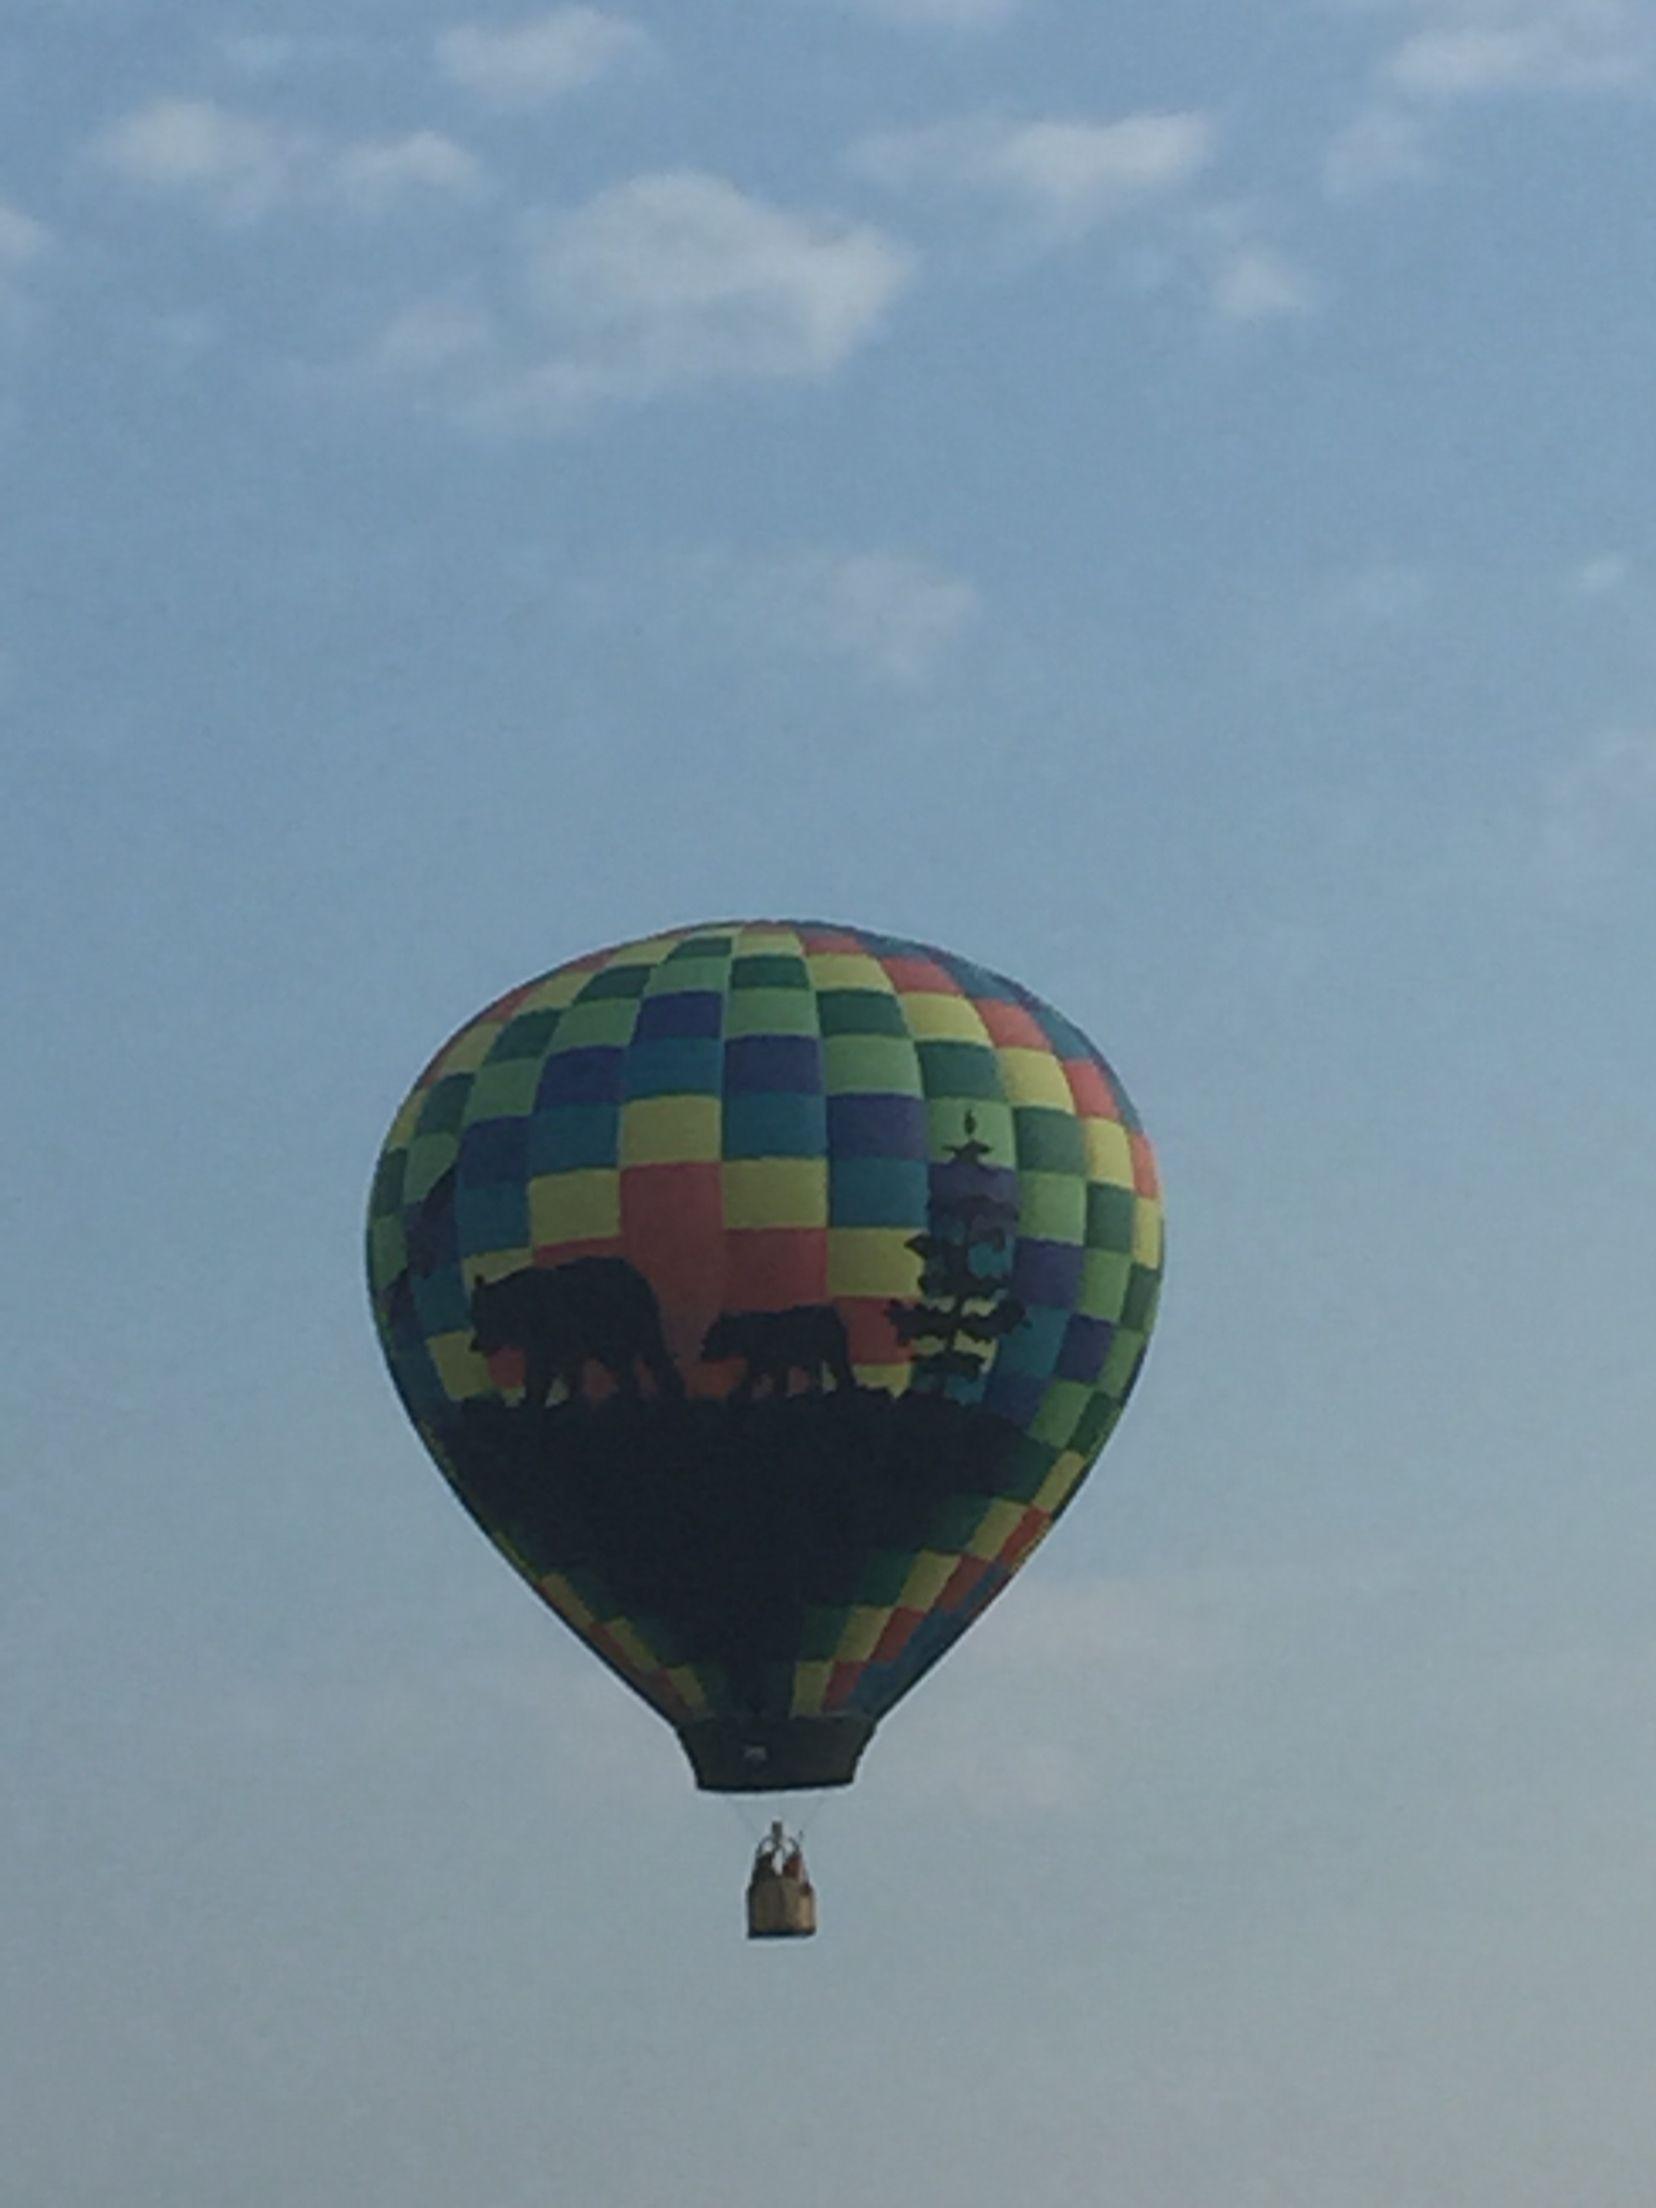 New Jersey Festival of Ballooning at SolbergHunterdon